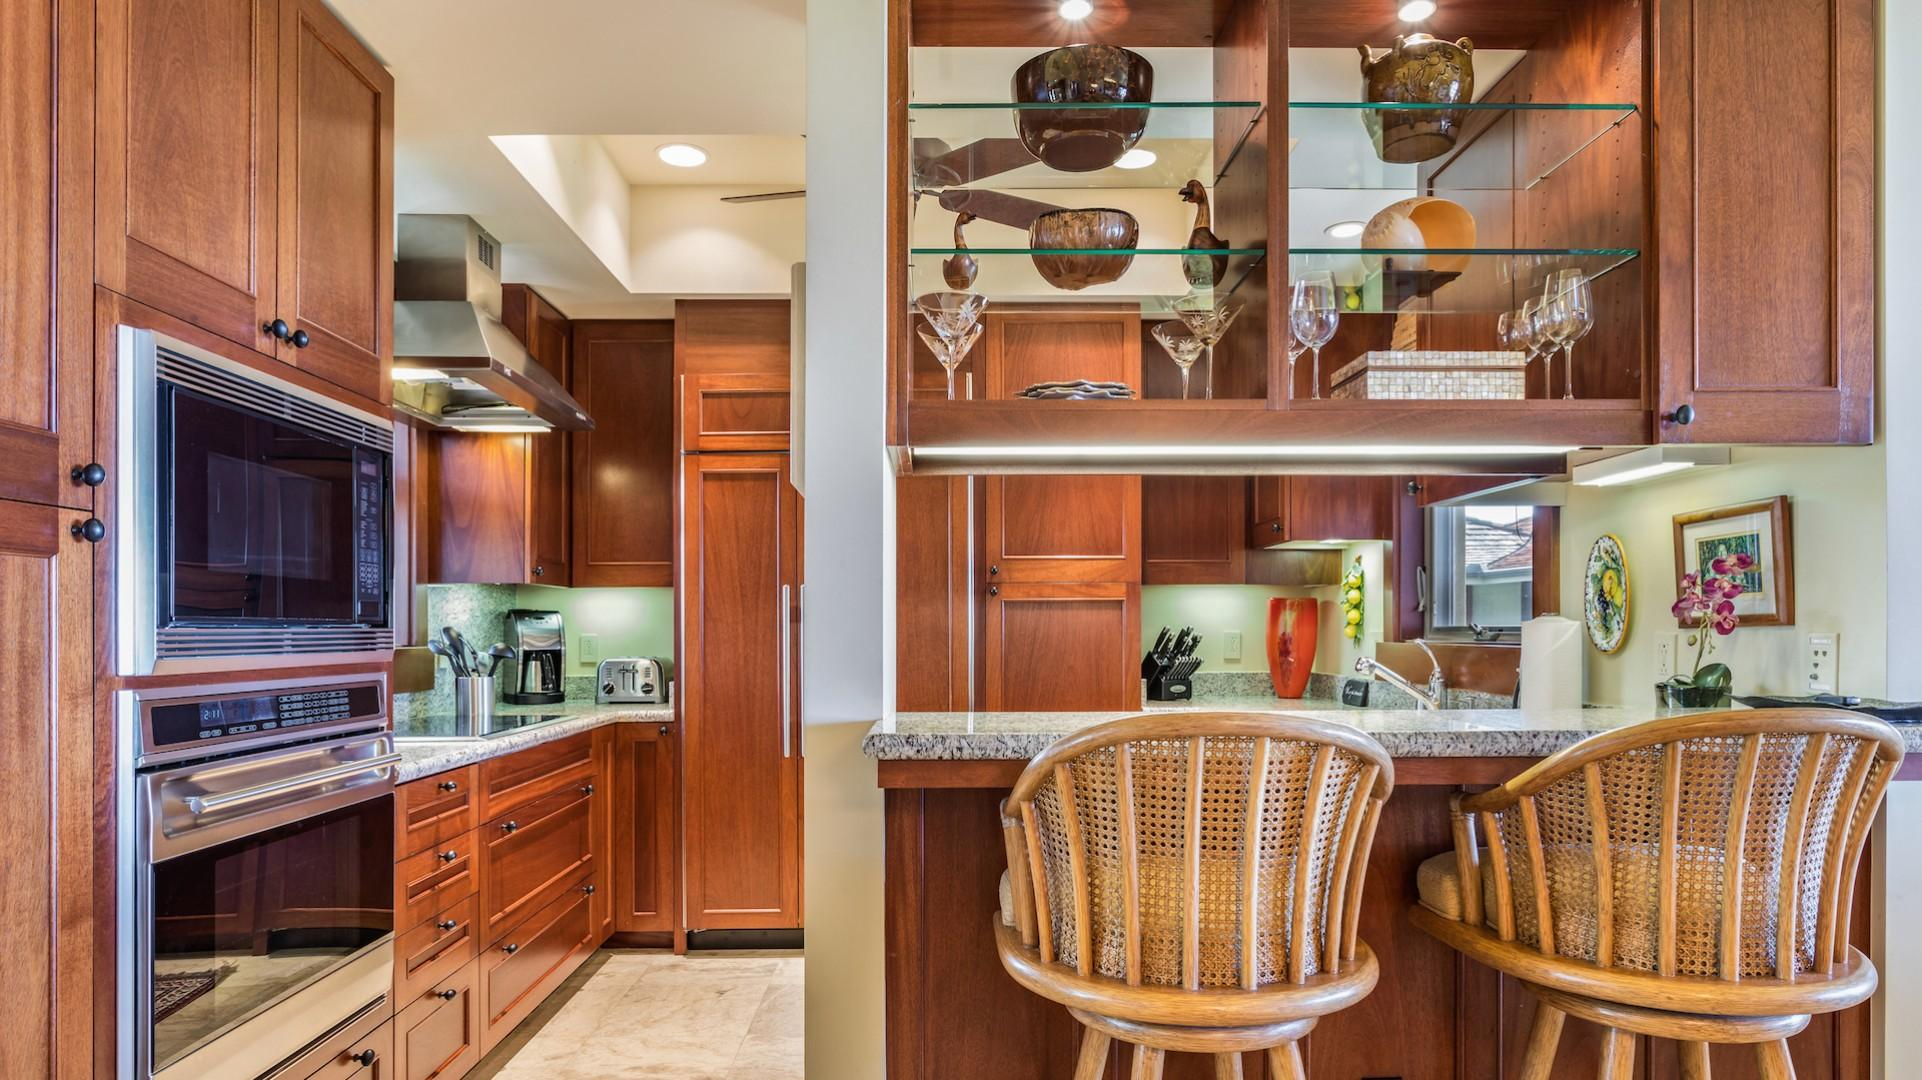 Modern Gourmet Kitchen with Bar Seating.